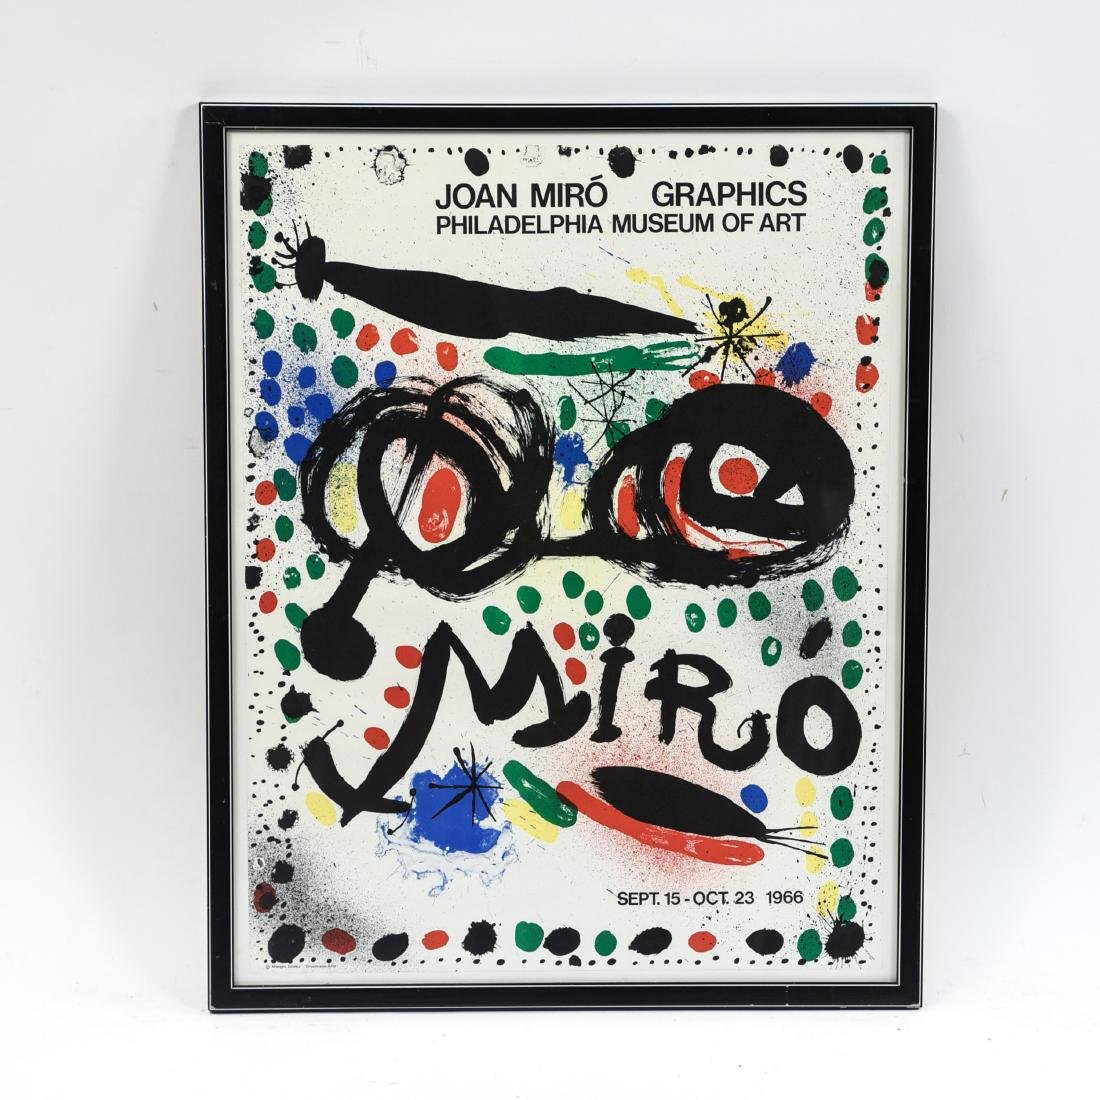 JOAN MIRO VINTAGE POSTER GRAPHICS 1966